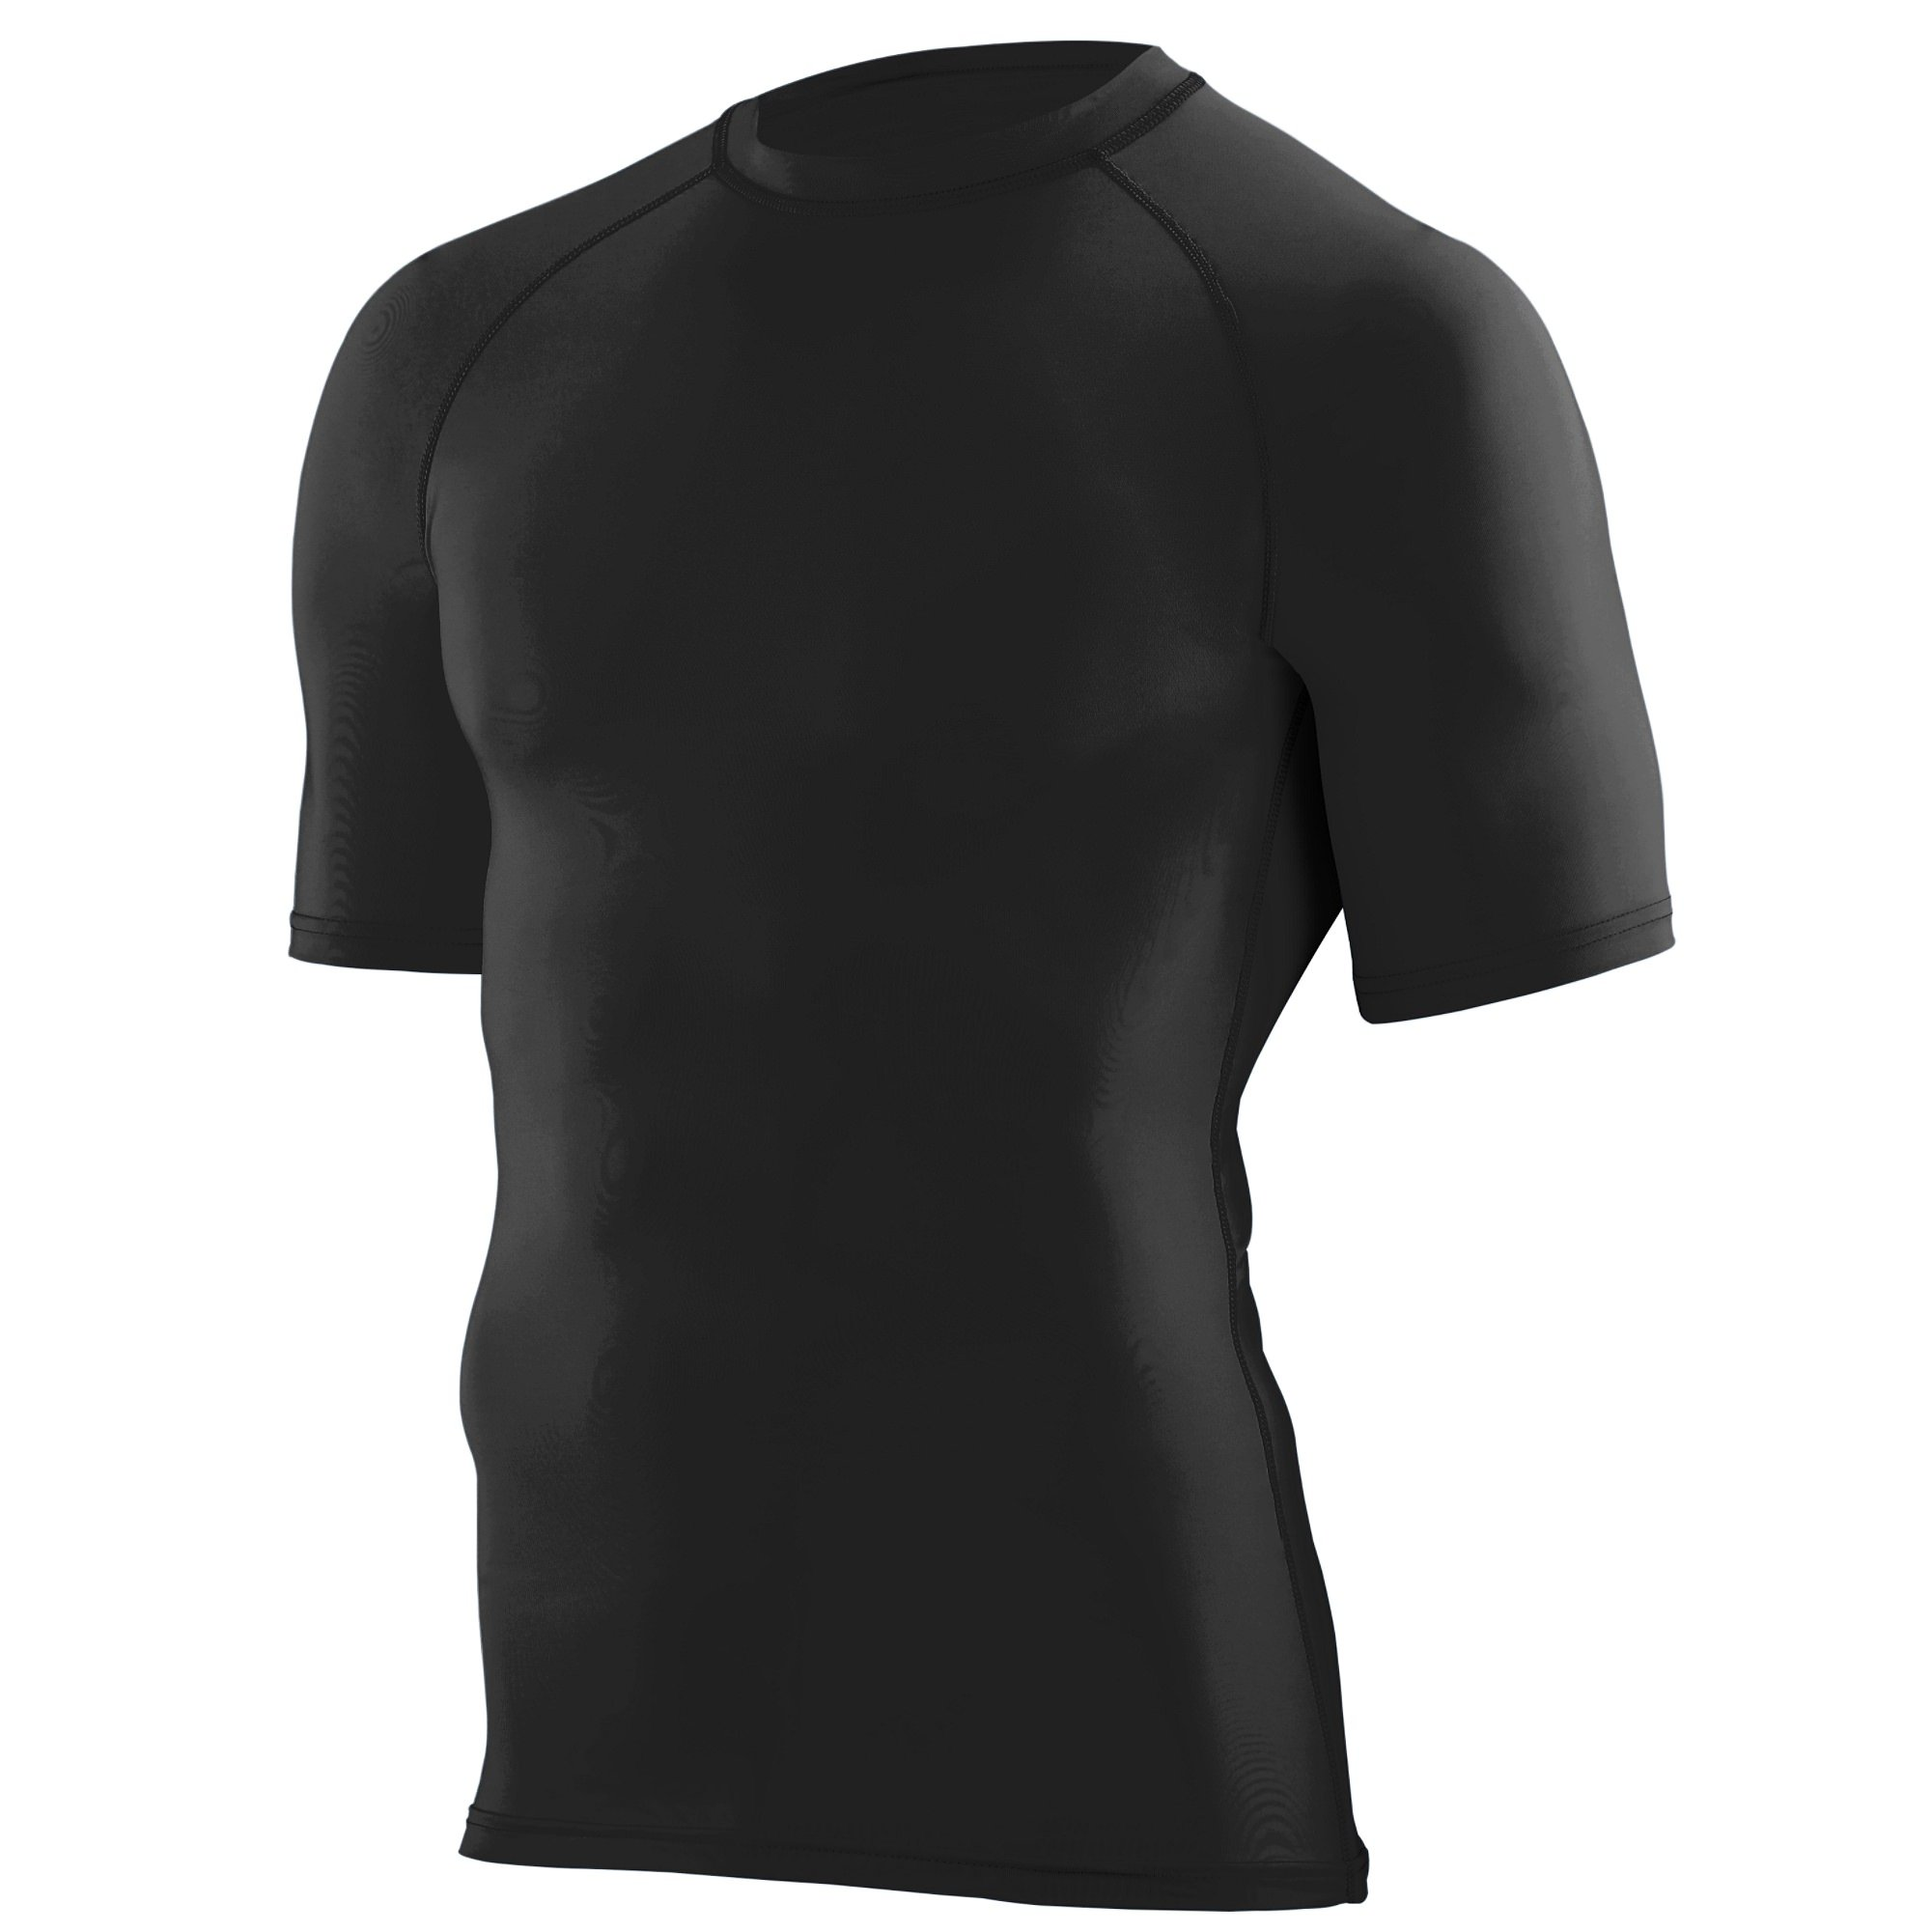 Augusta Sportswear Boys' Hyperform Compression Short Sleeve Shirt S Black